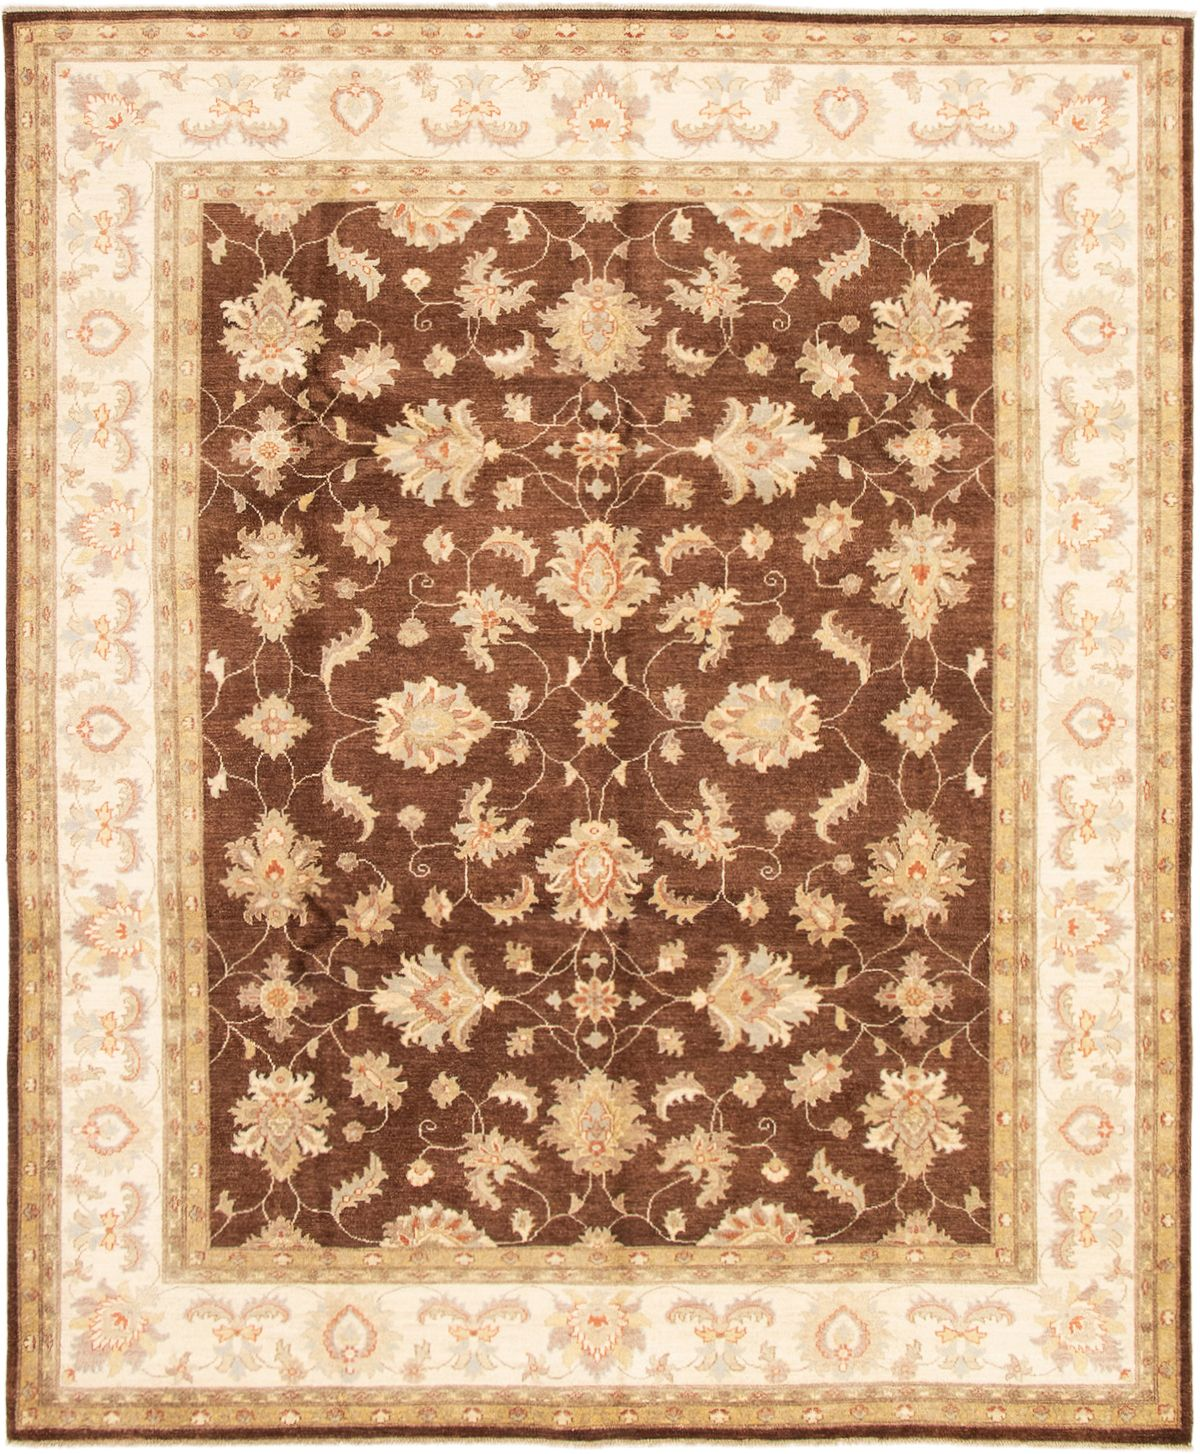 "Hand-knotted Peshawar Oushak Dark Brown Wool Rug 8'1"" x 9'8"" Size: 8'1"" x 9'8"""